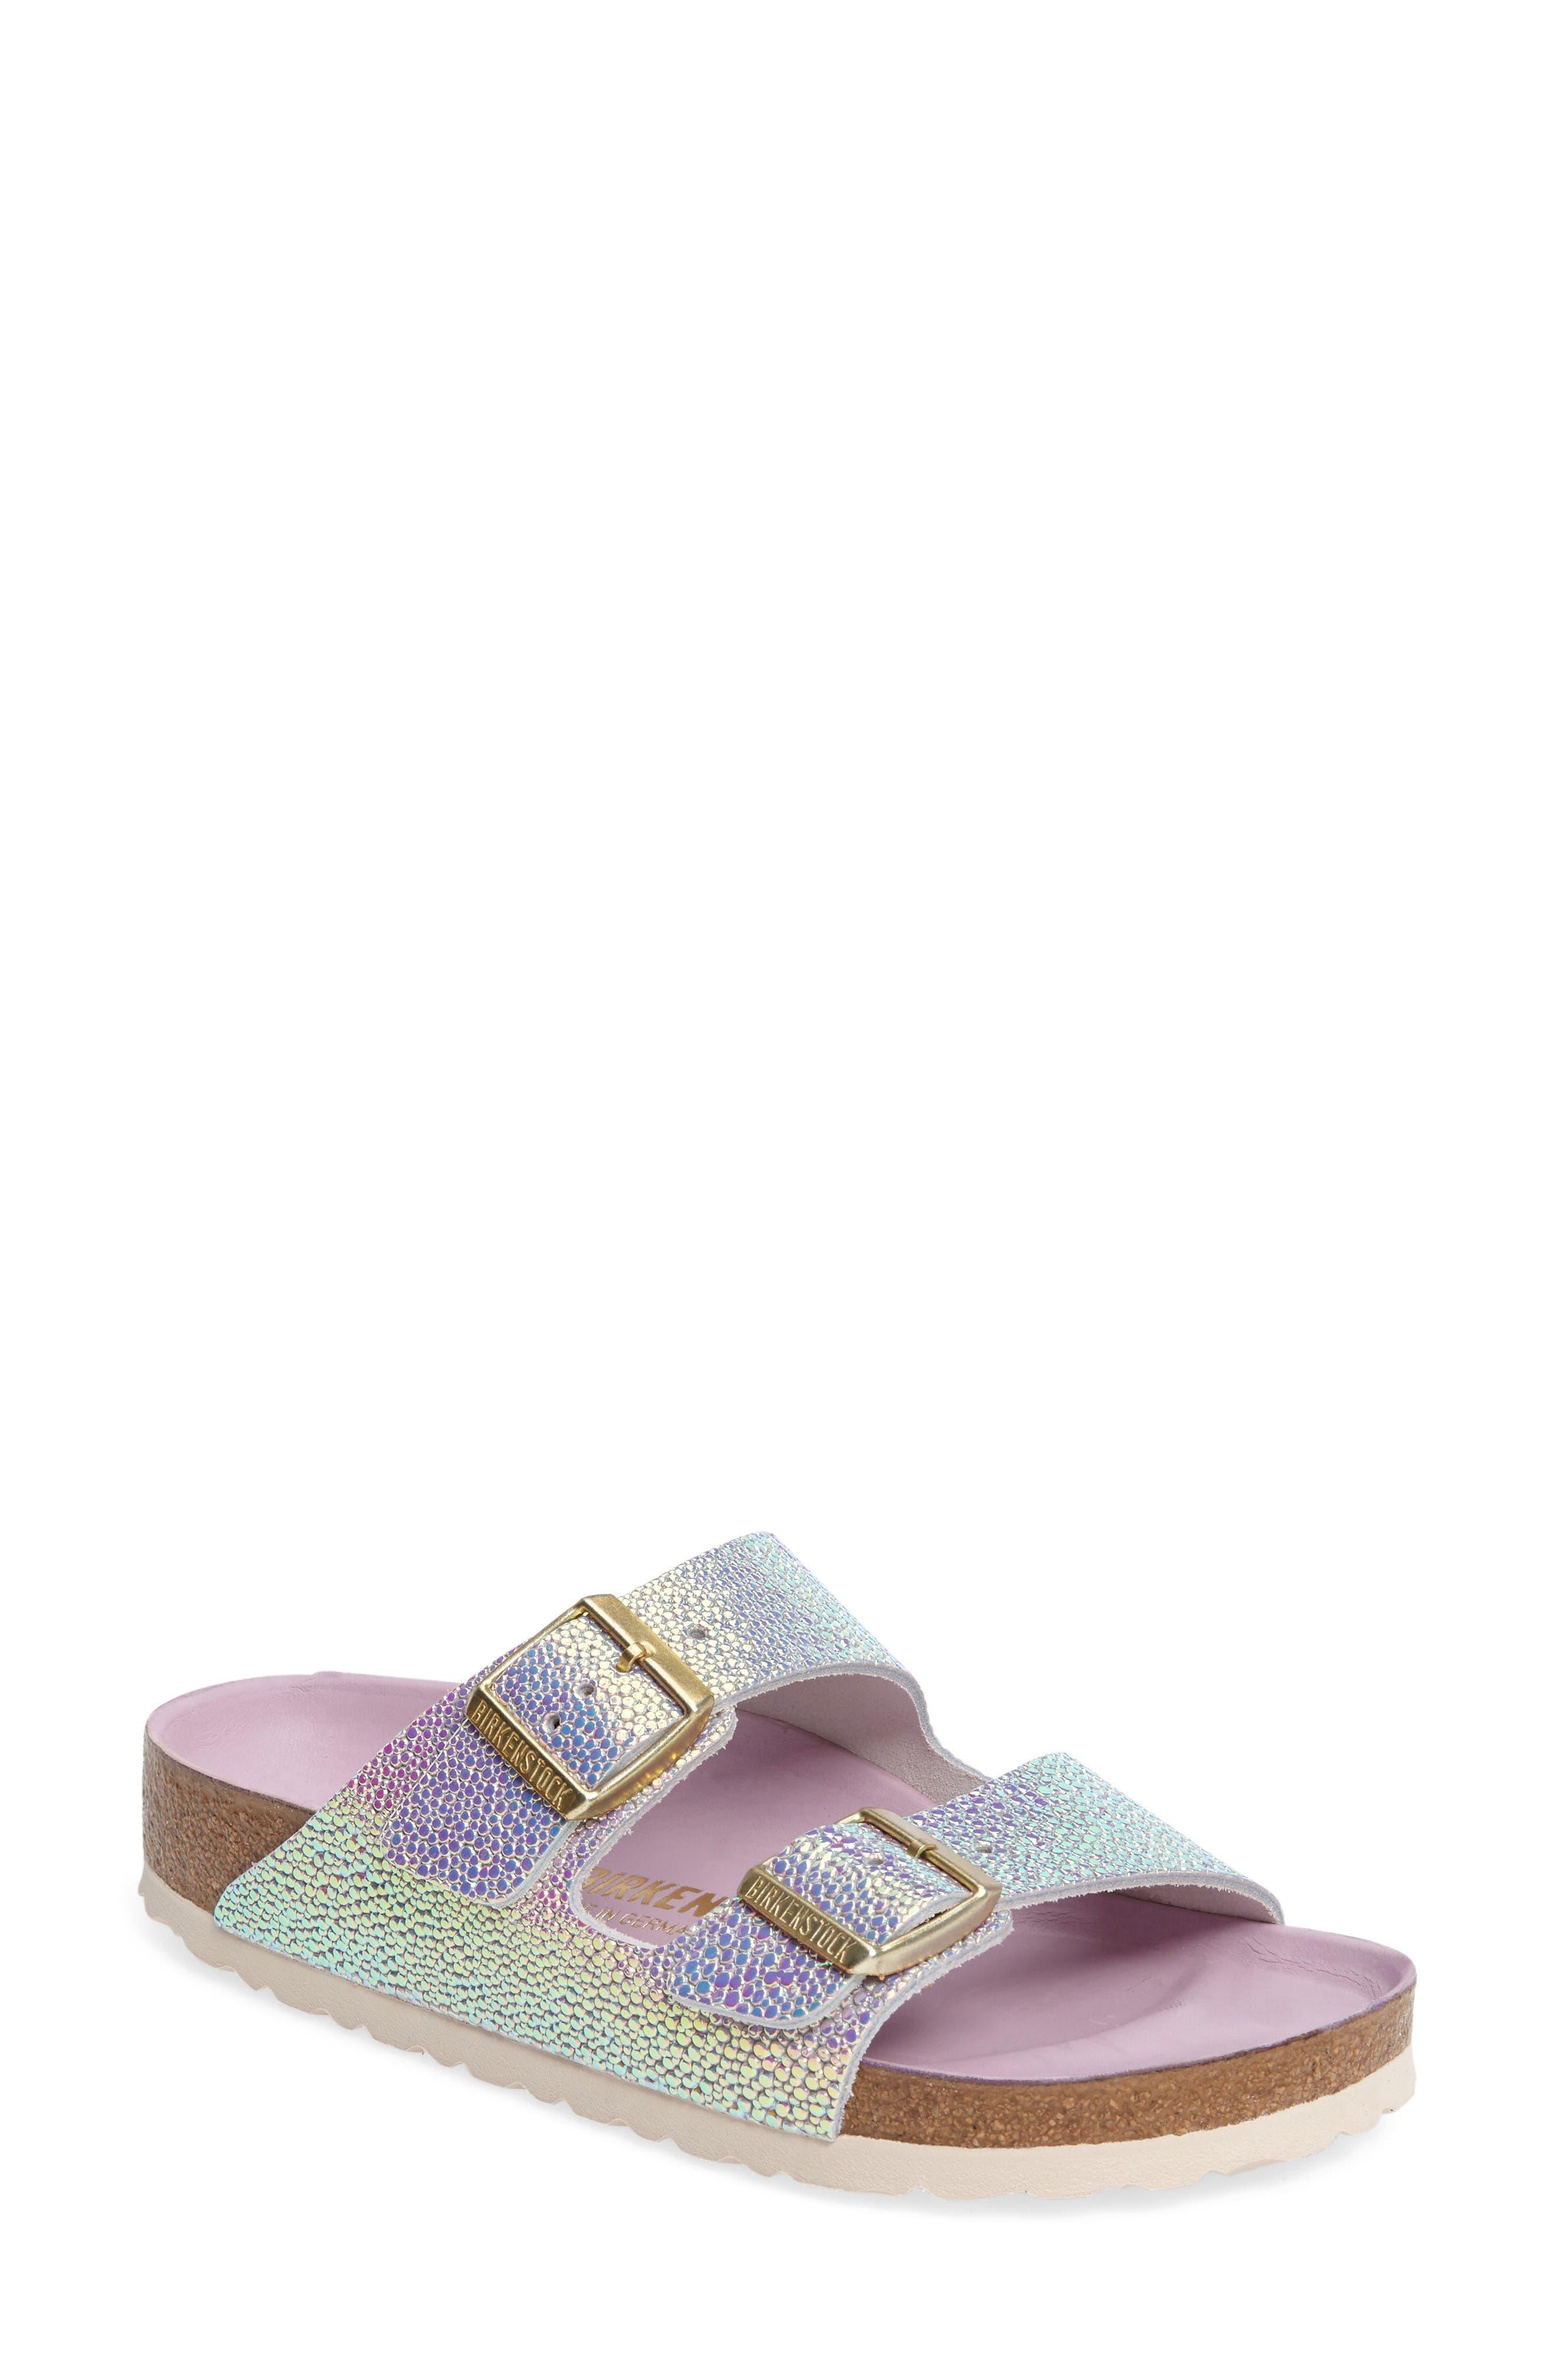 Alternate Image 1 Selected - Birkenstock Arizona Lux Iridescent Slide Sandal (Women)